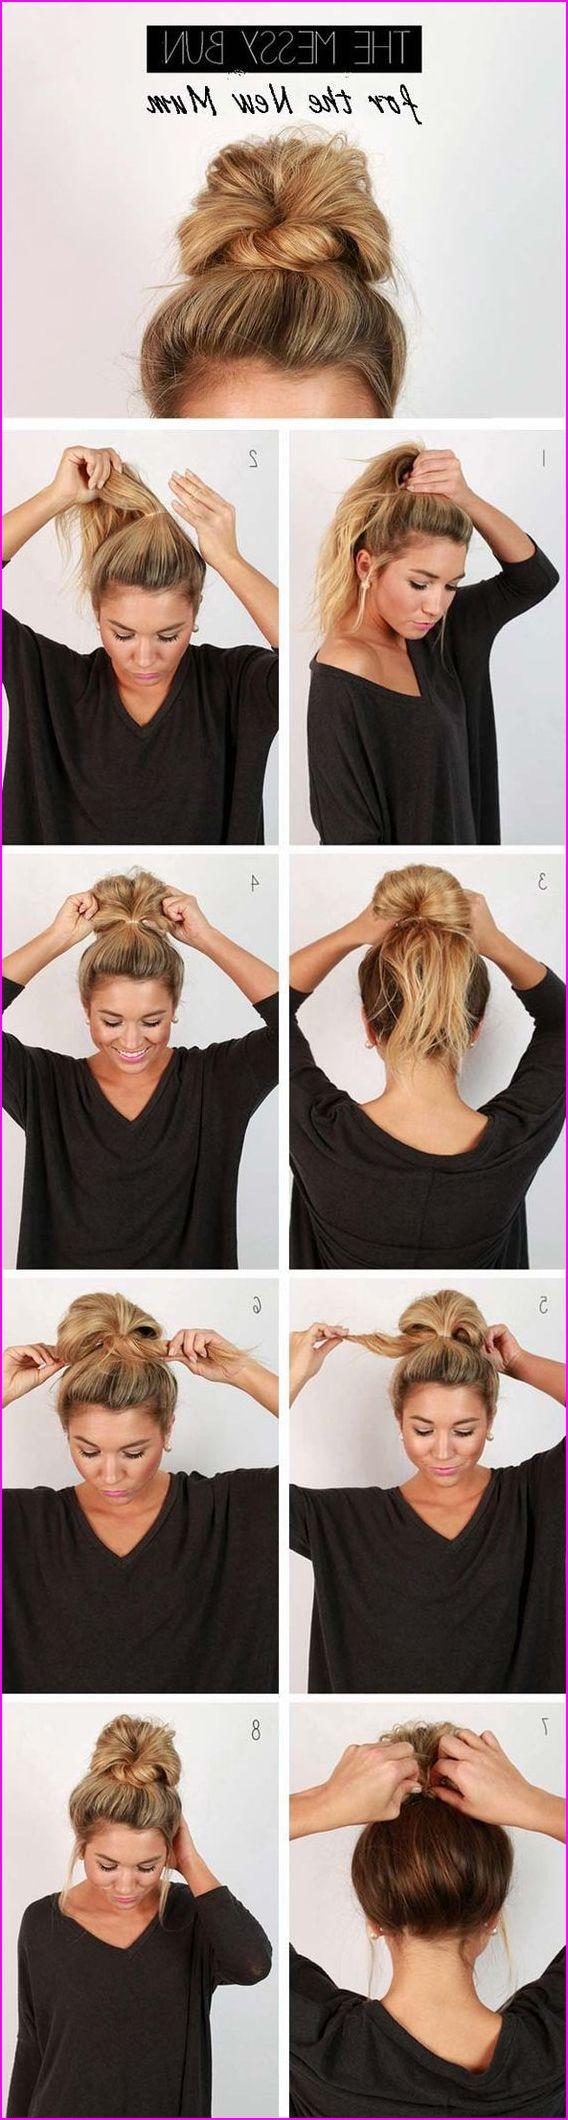 cute hairstyles stepbystep tutorials for long hair